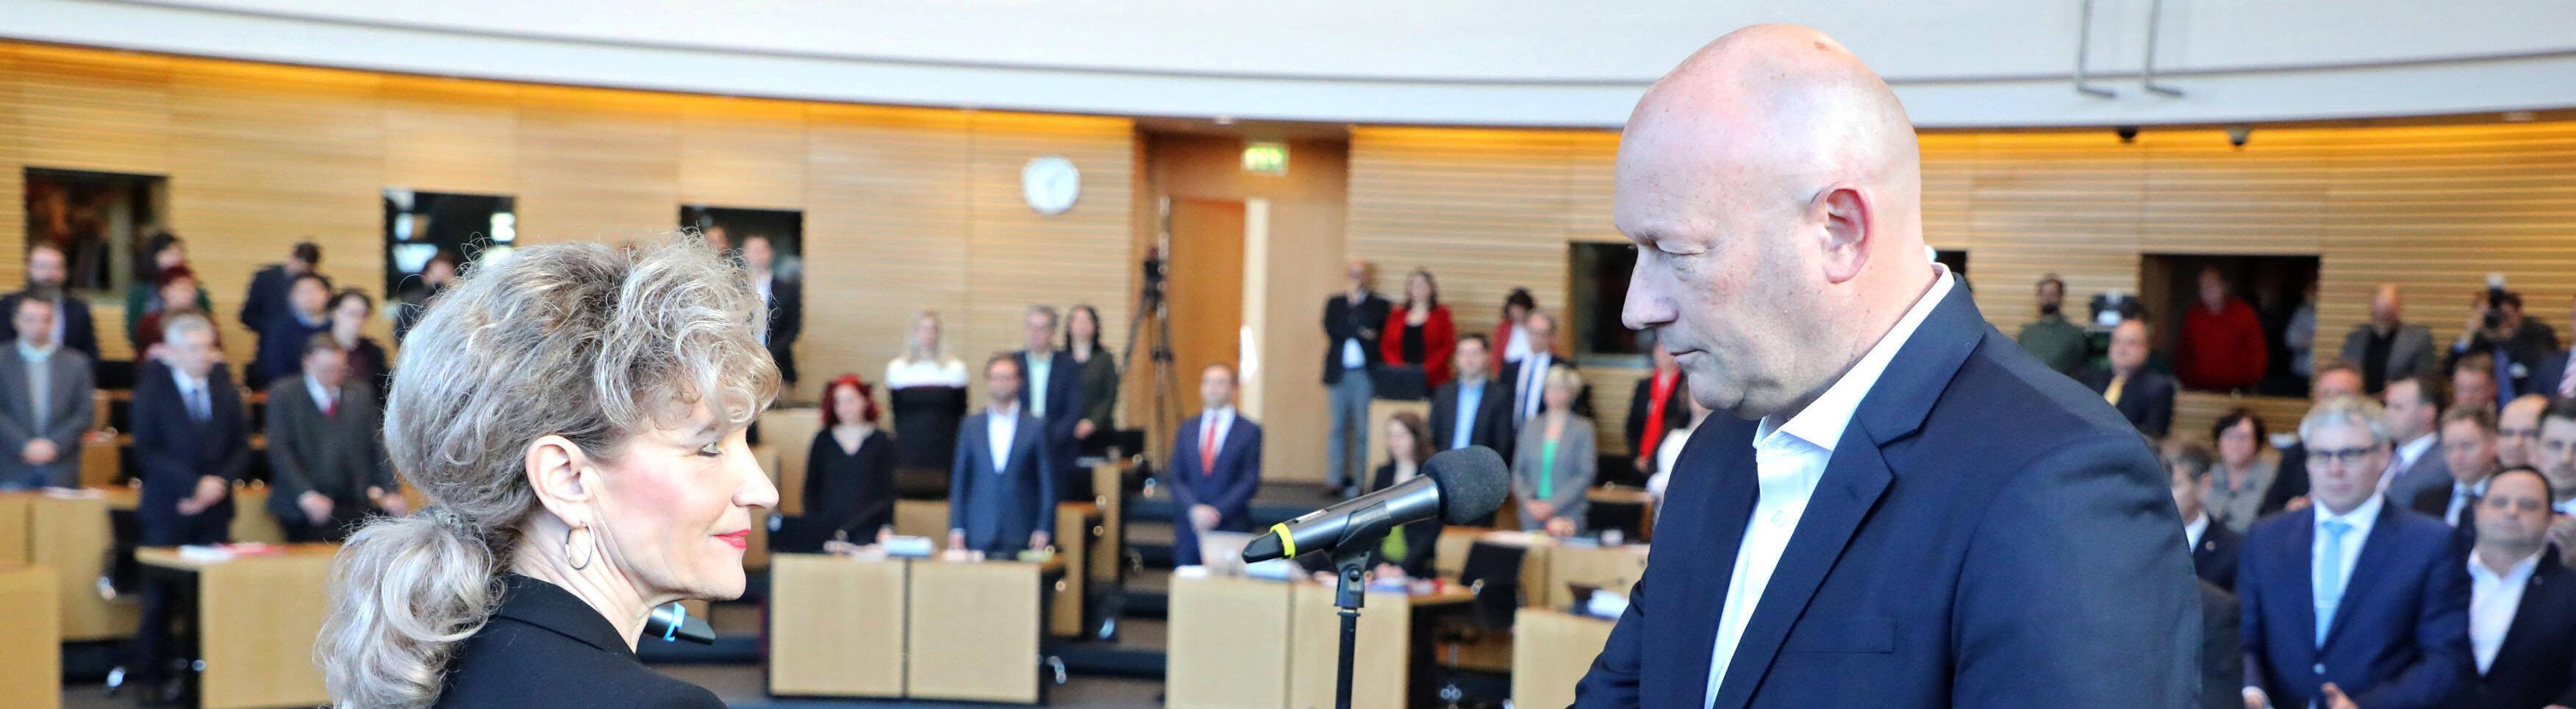 Wahl des neuen Ministerpräsidenten Thüringen. Wahl des neuen Ministerpräsidenten Thüringen am 05.02.2020 im Thüringer Landtag in Erfurt. Birgit Keller ( Die Linke ) vereidigt Thomas L. Kemmerich ( FDP ), den neu gewählten Ministerpräsidenten in Thüringen.